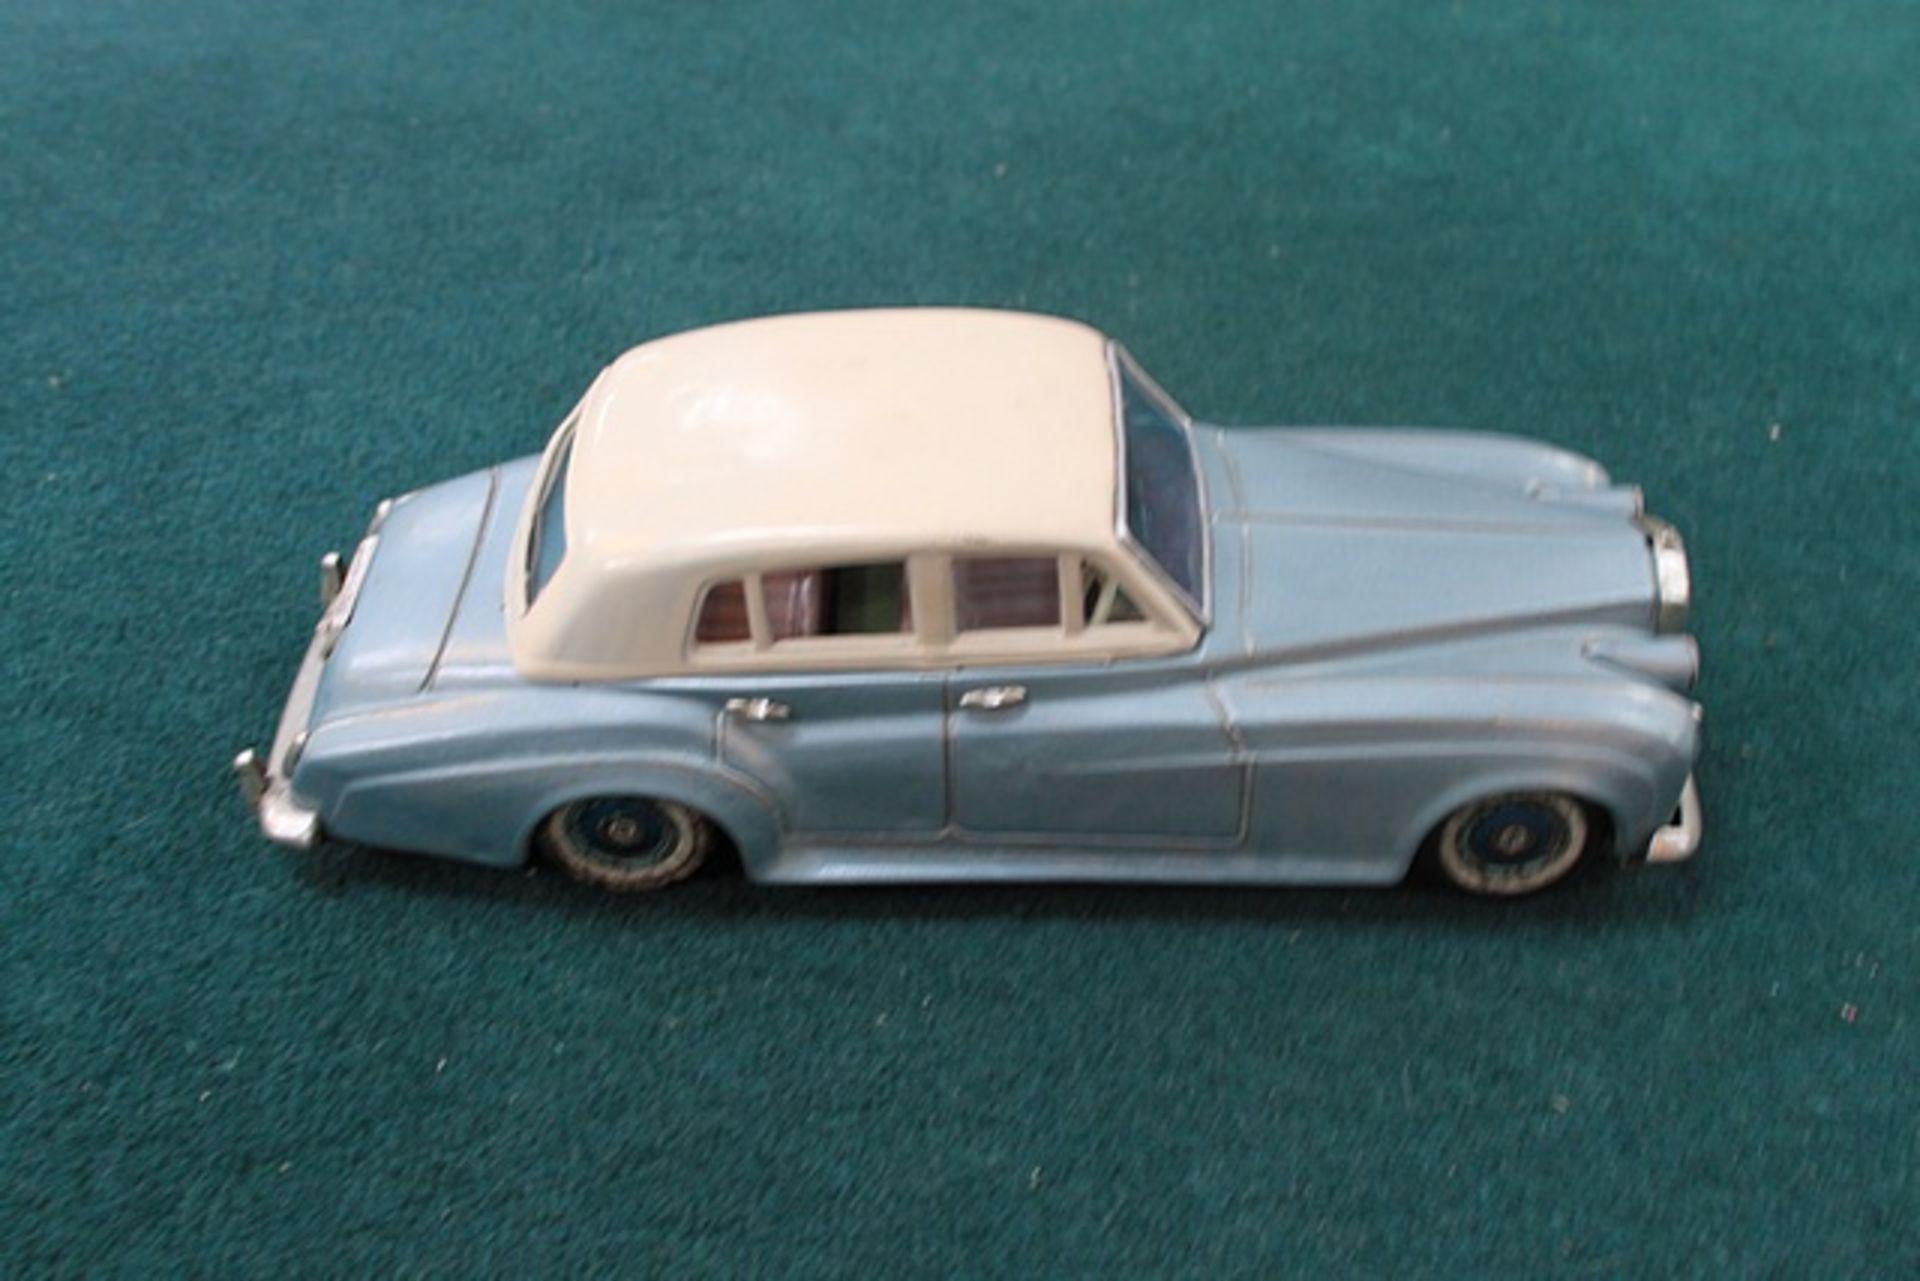 Lot 380 - Bandai (Japan) Tinplate Friction Drive Rolls Royce Silver Cloud Circa 1960's